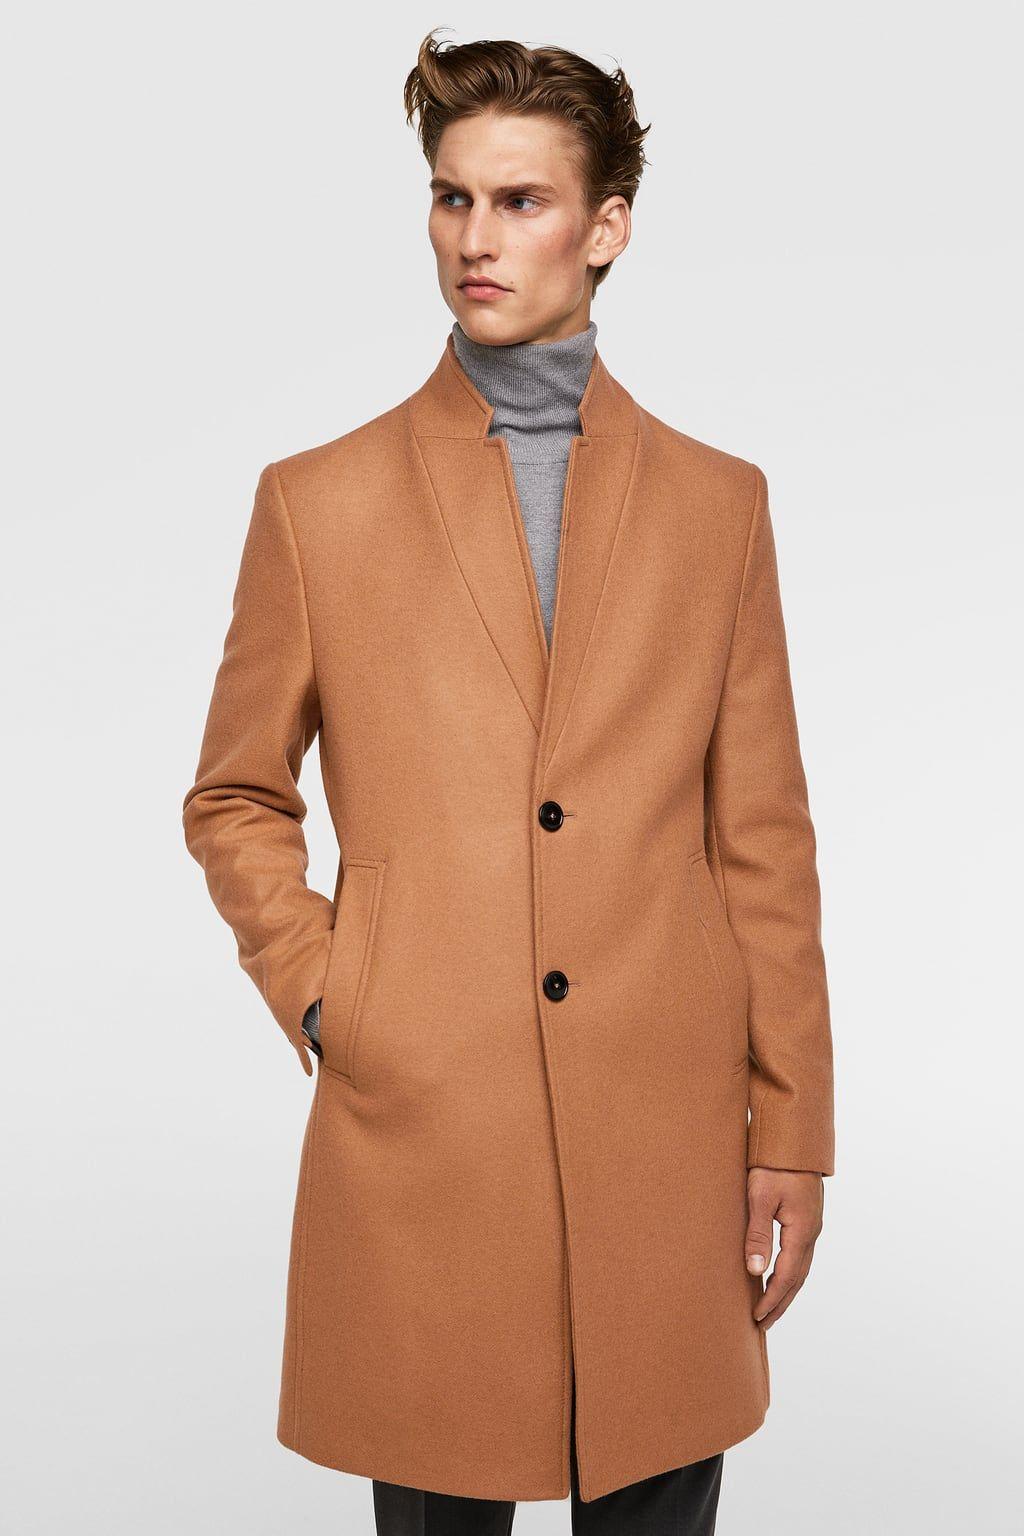 0ae30c315d LAPEL COAT - Item available in more colors | NY Trip | Coat, Men's ...